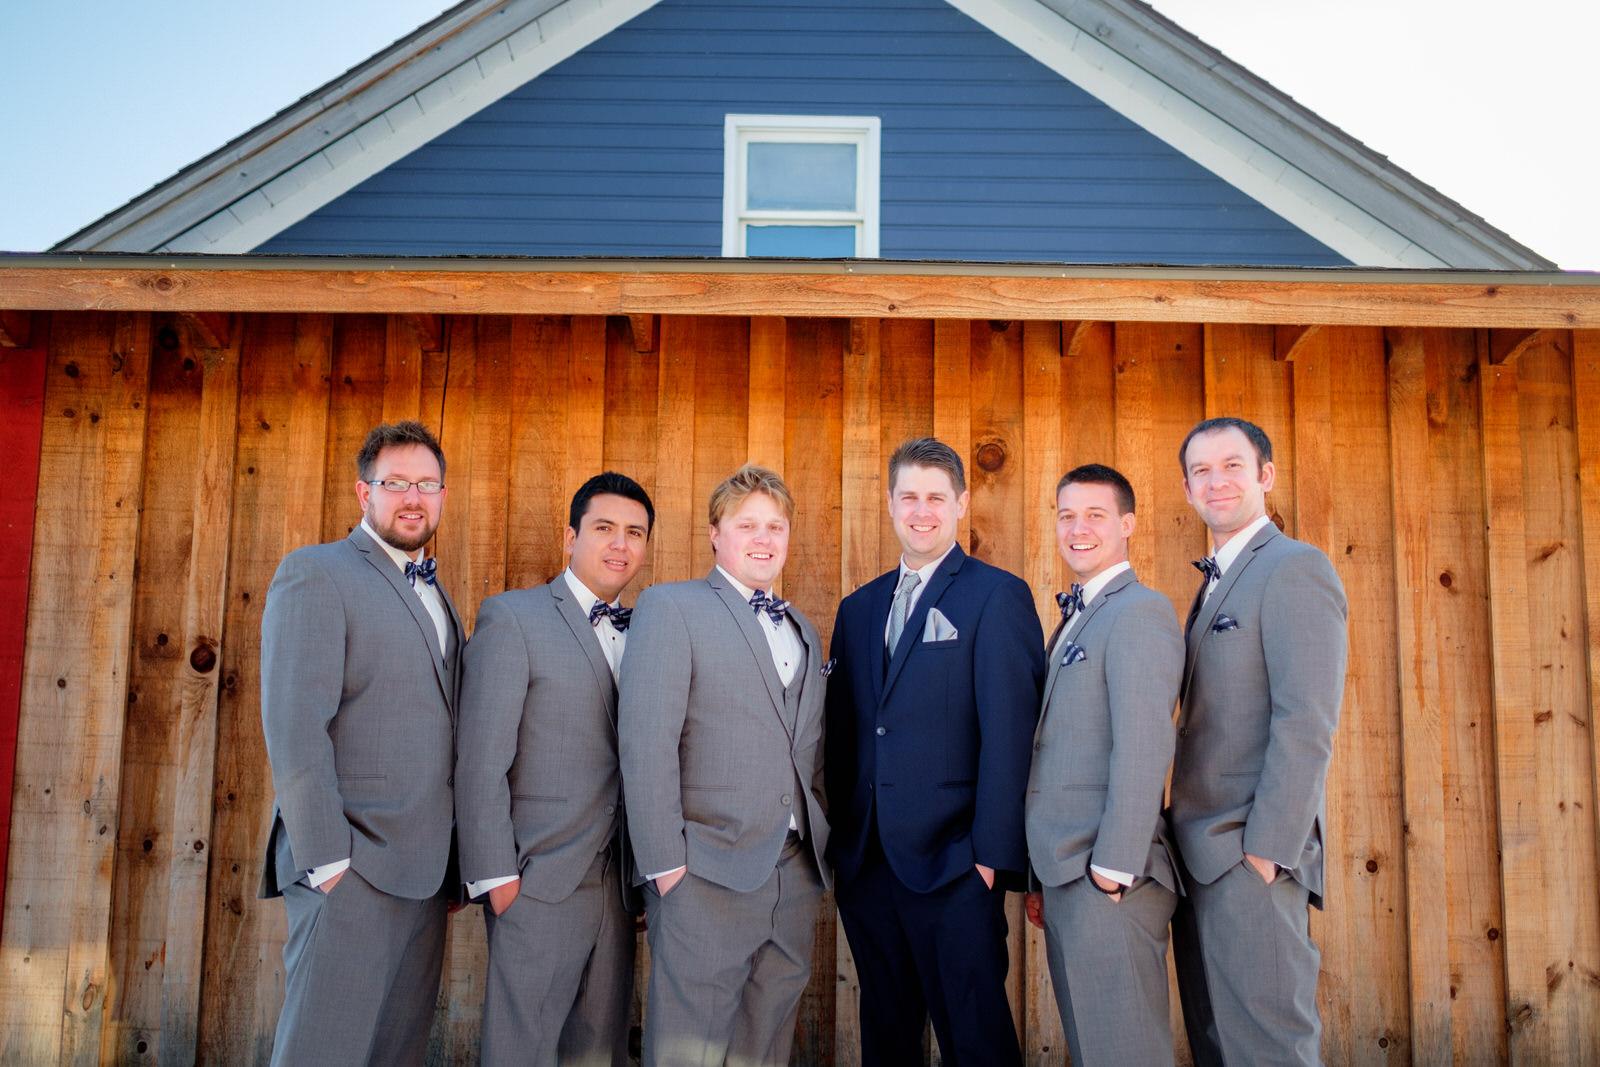 groomsmen at north house folk school wedding